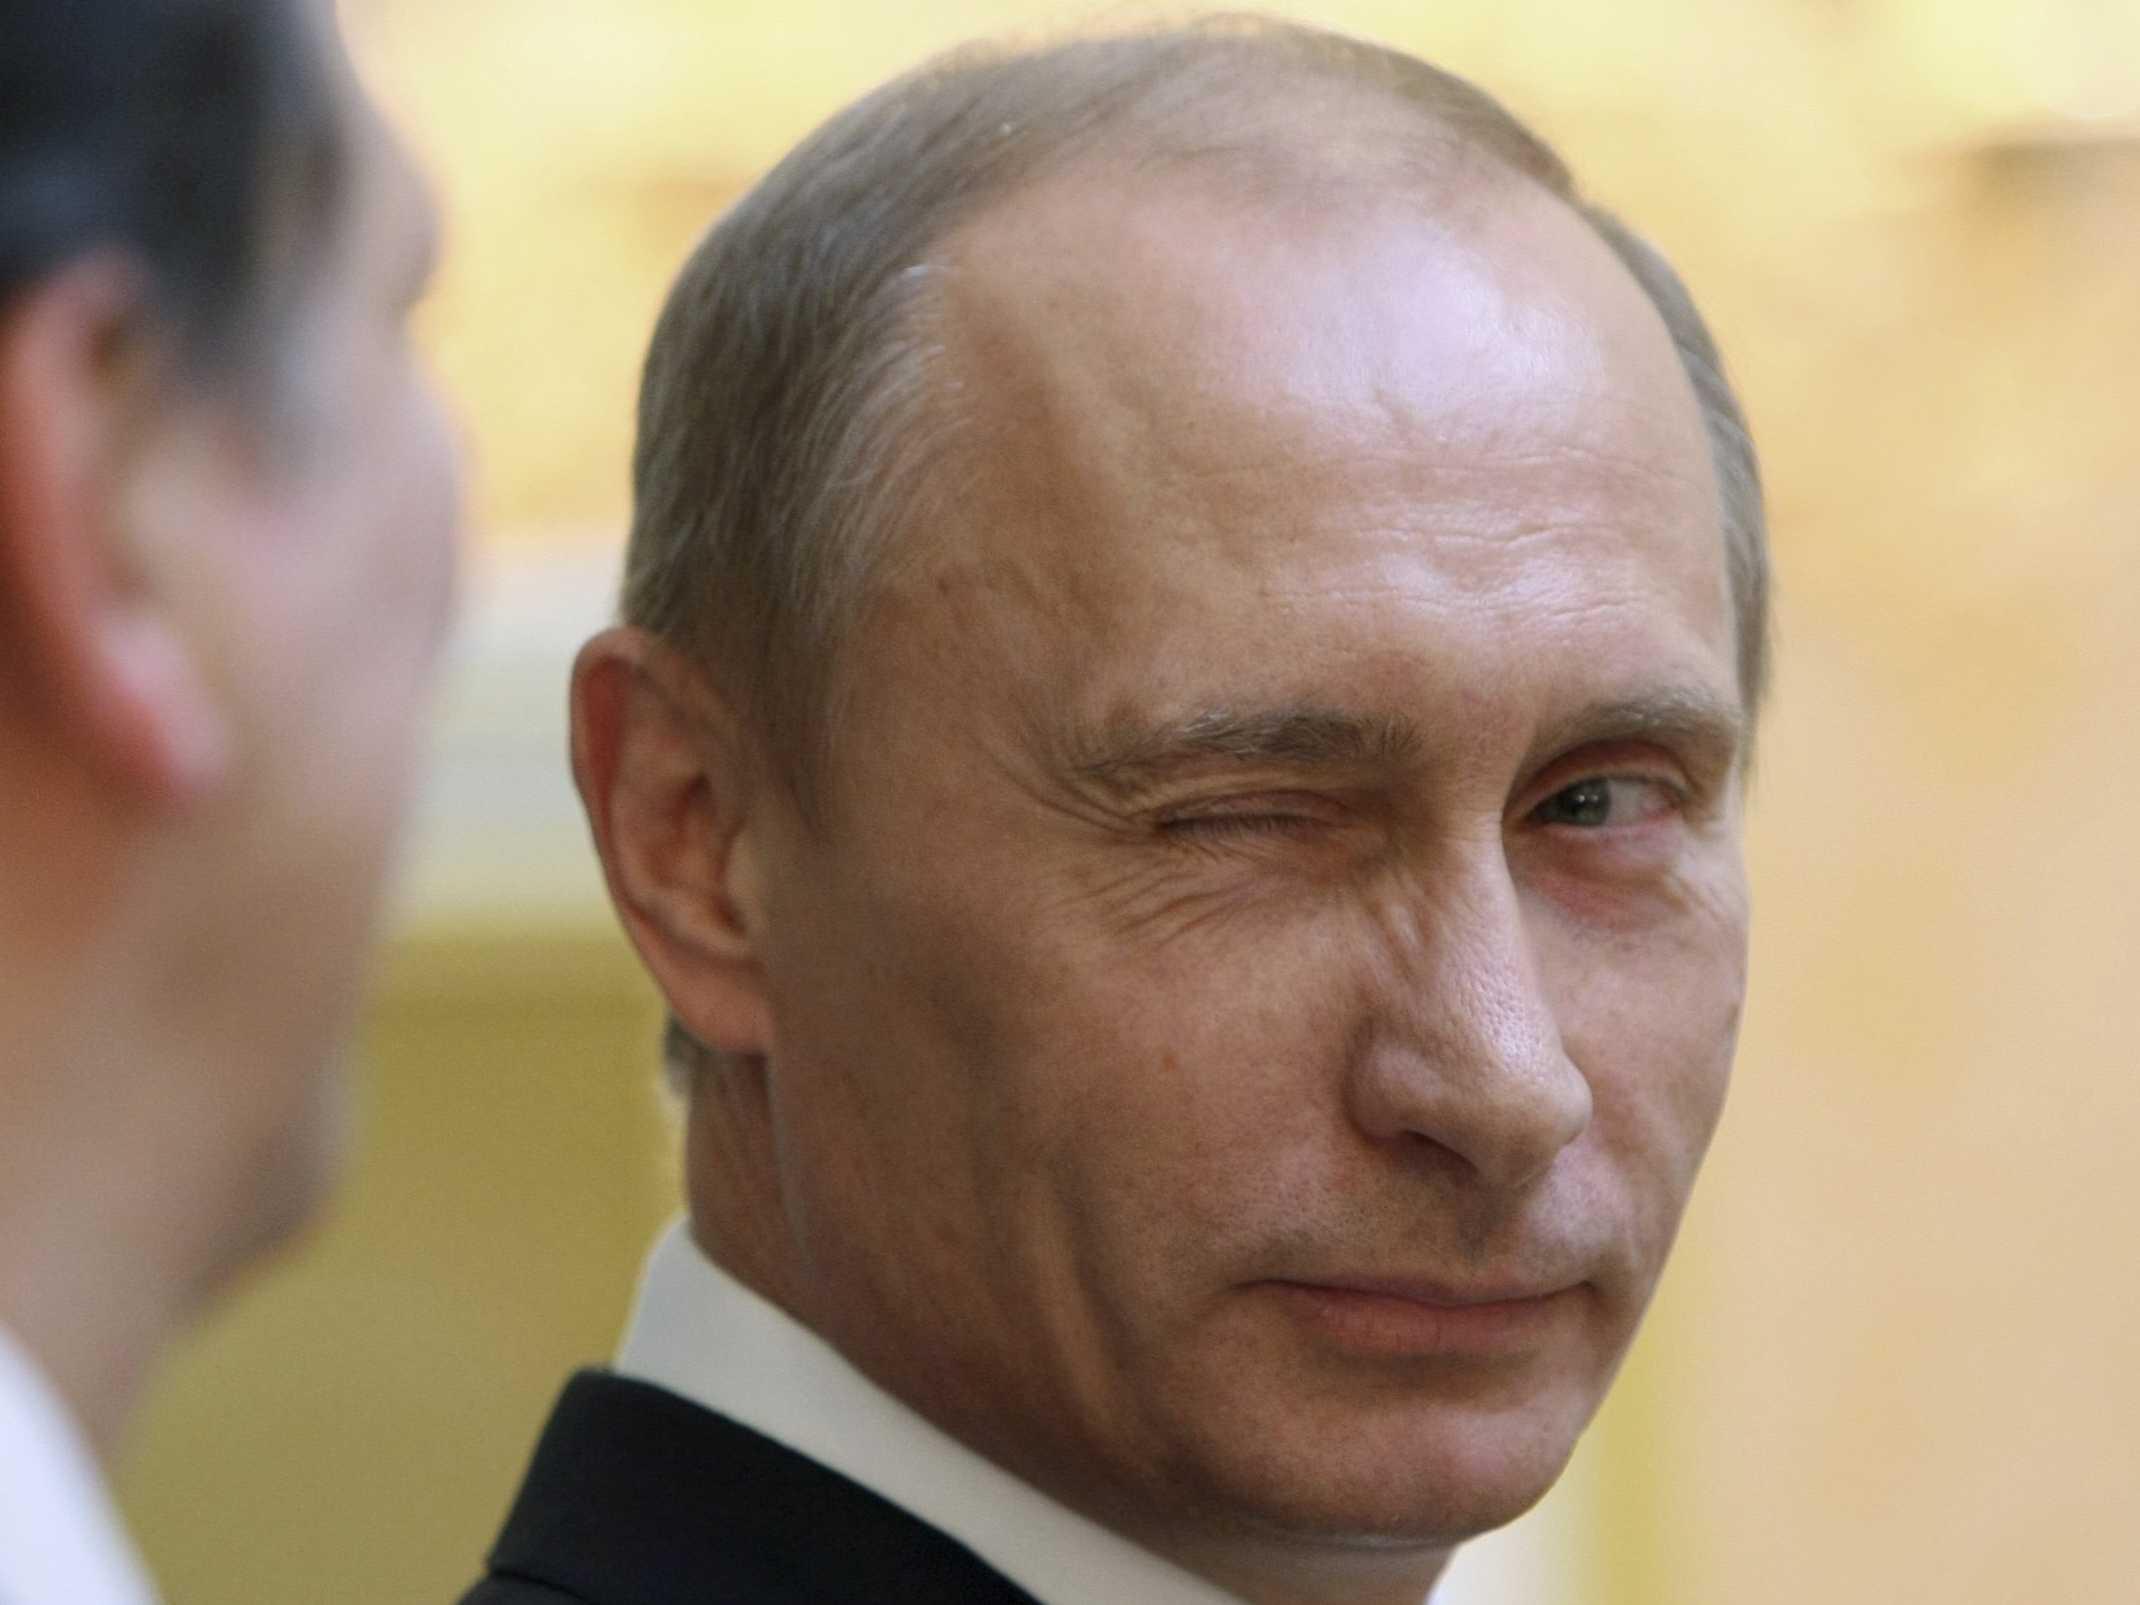 VİDEO | Putin'in ABD'ye 'one minute' dediği o konuşma